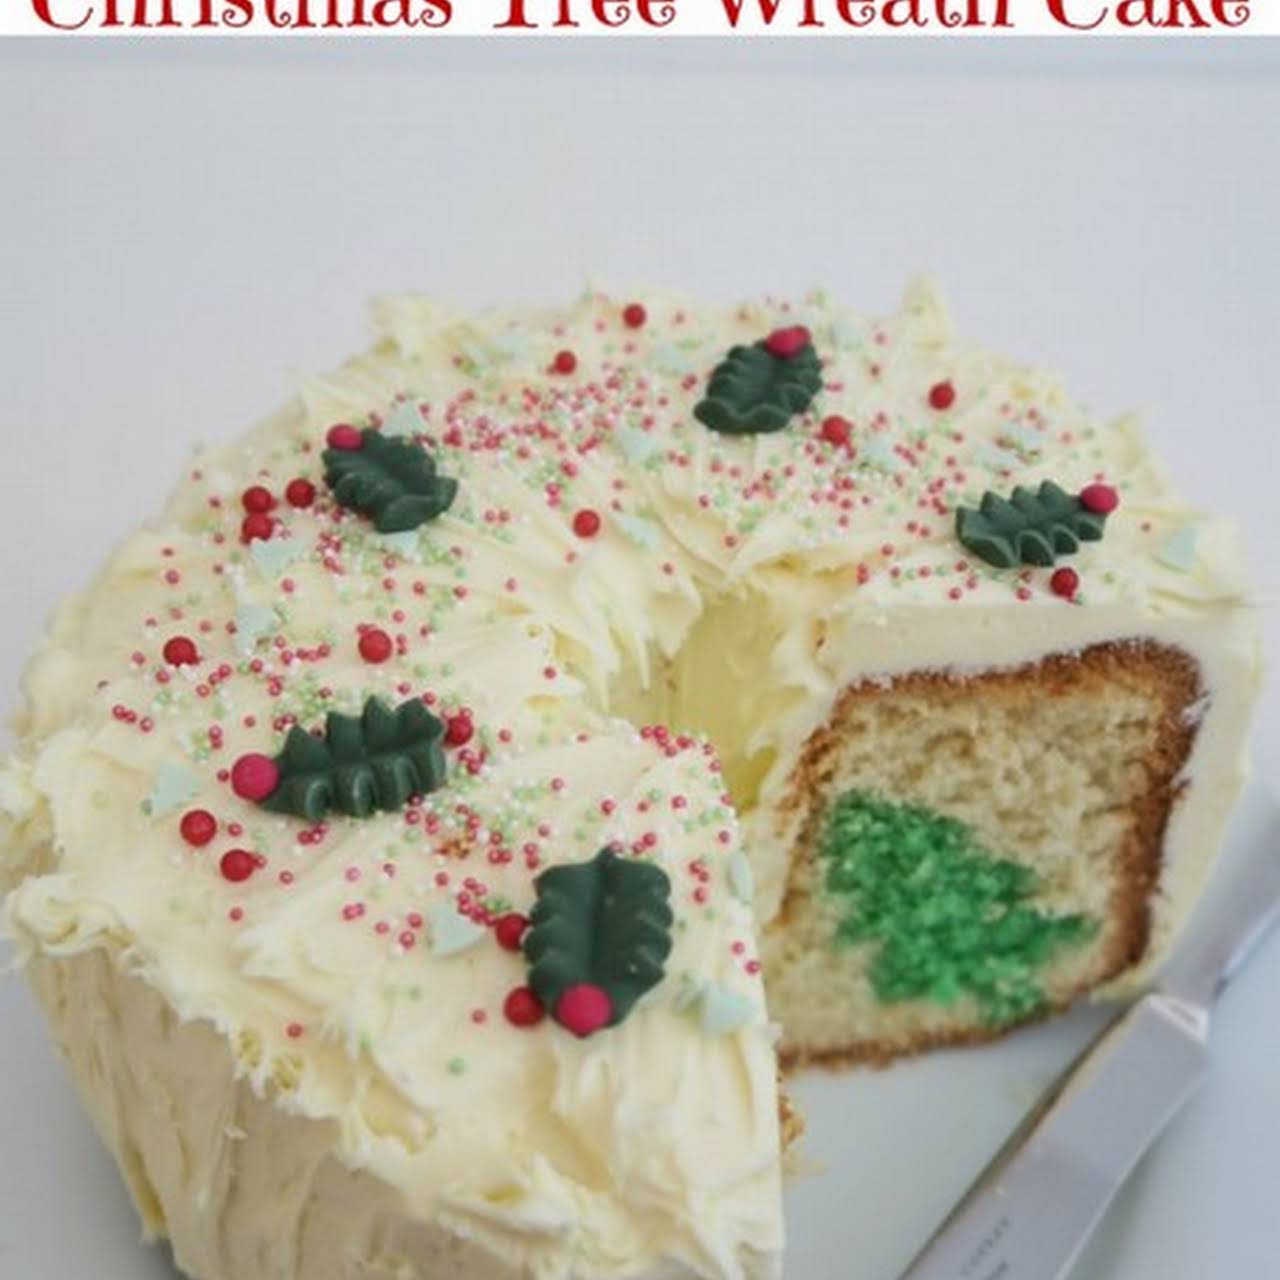 Christmas Tree Wreath Cake